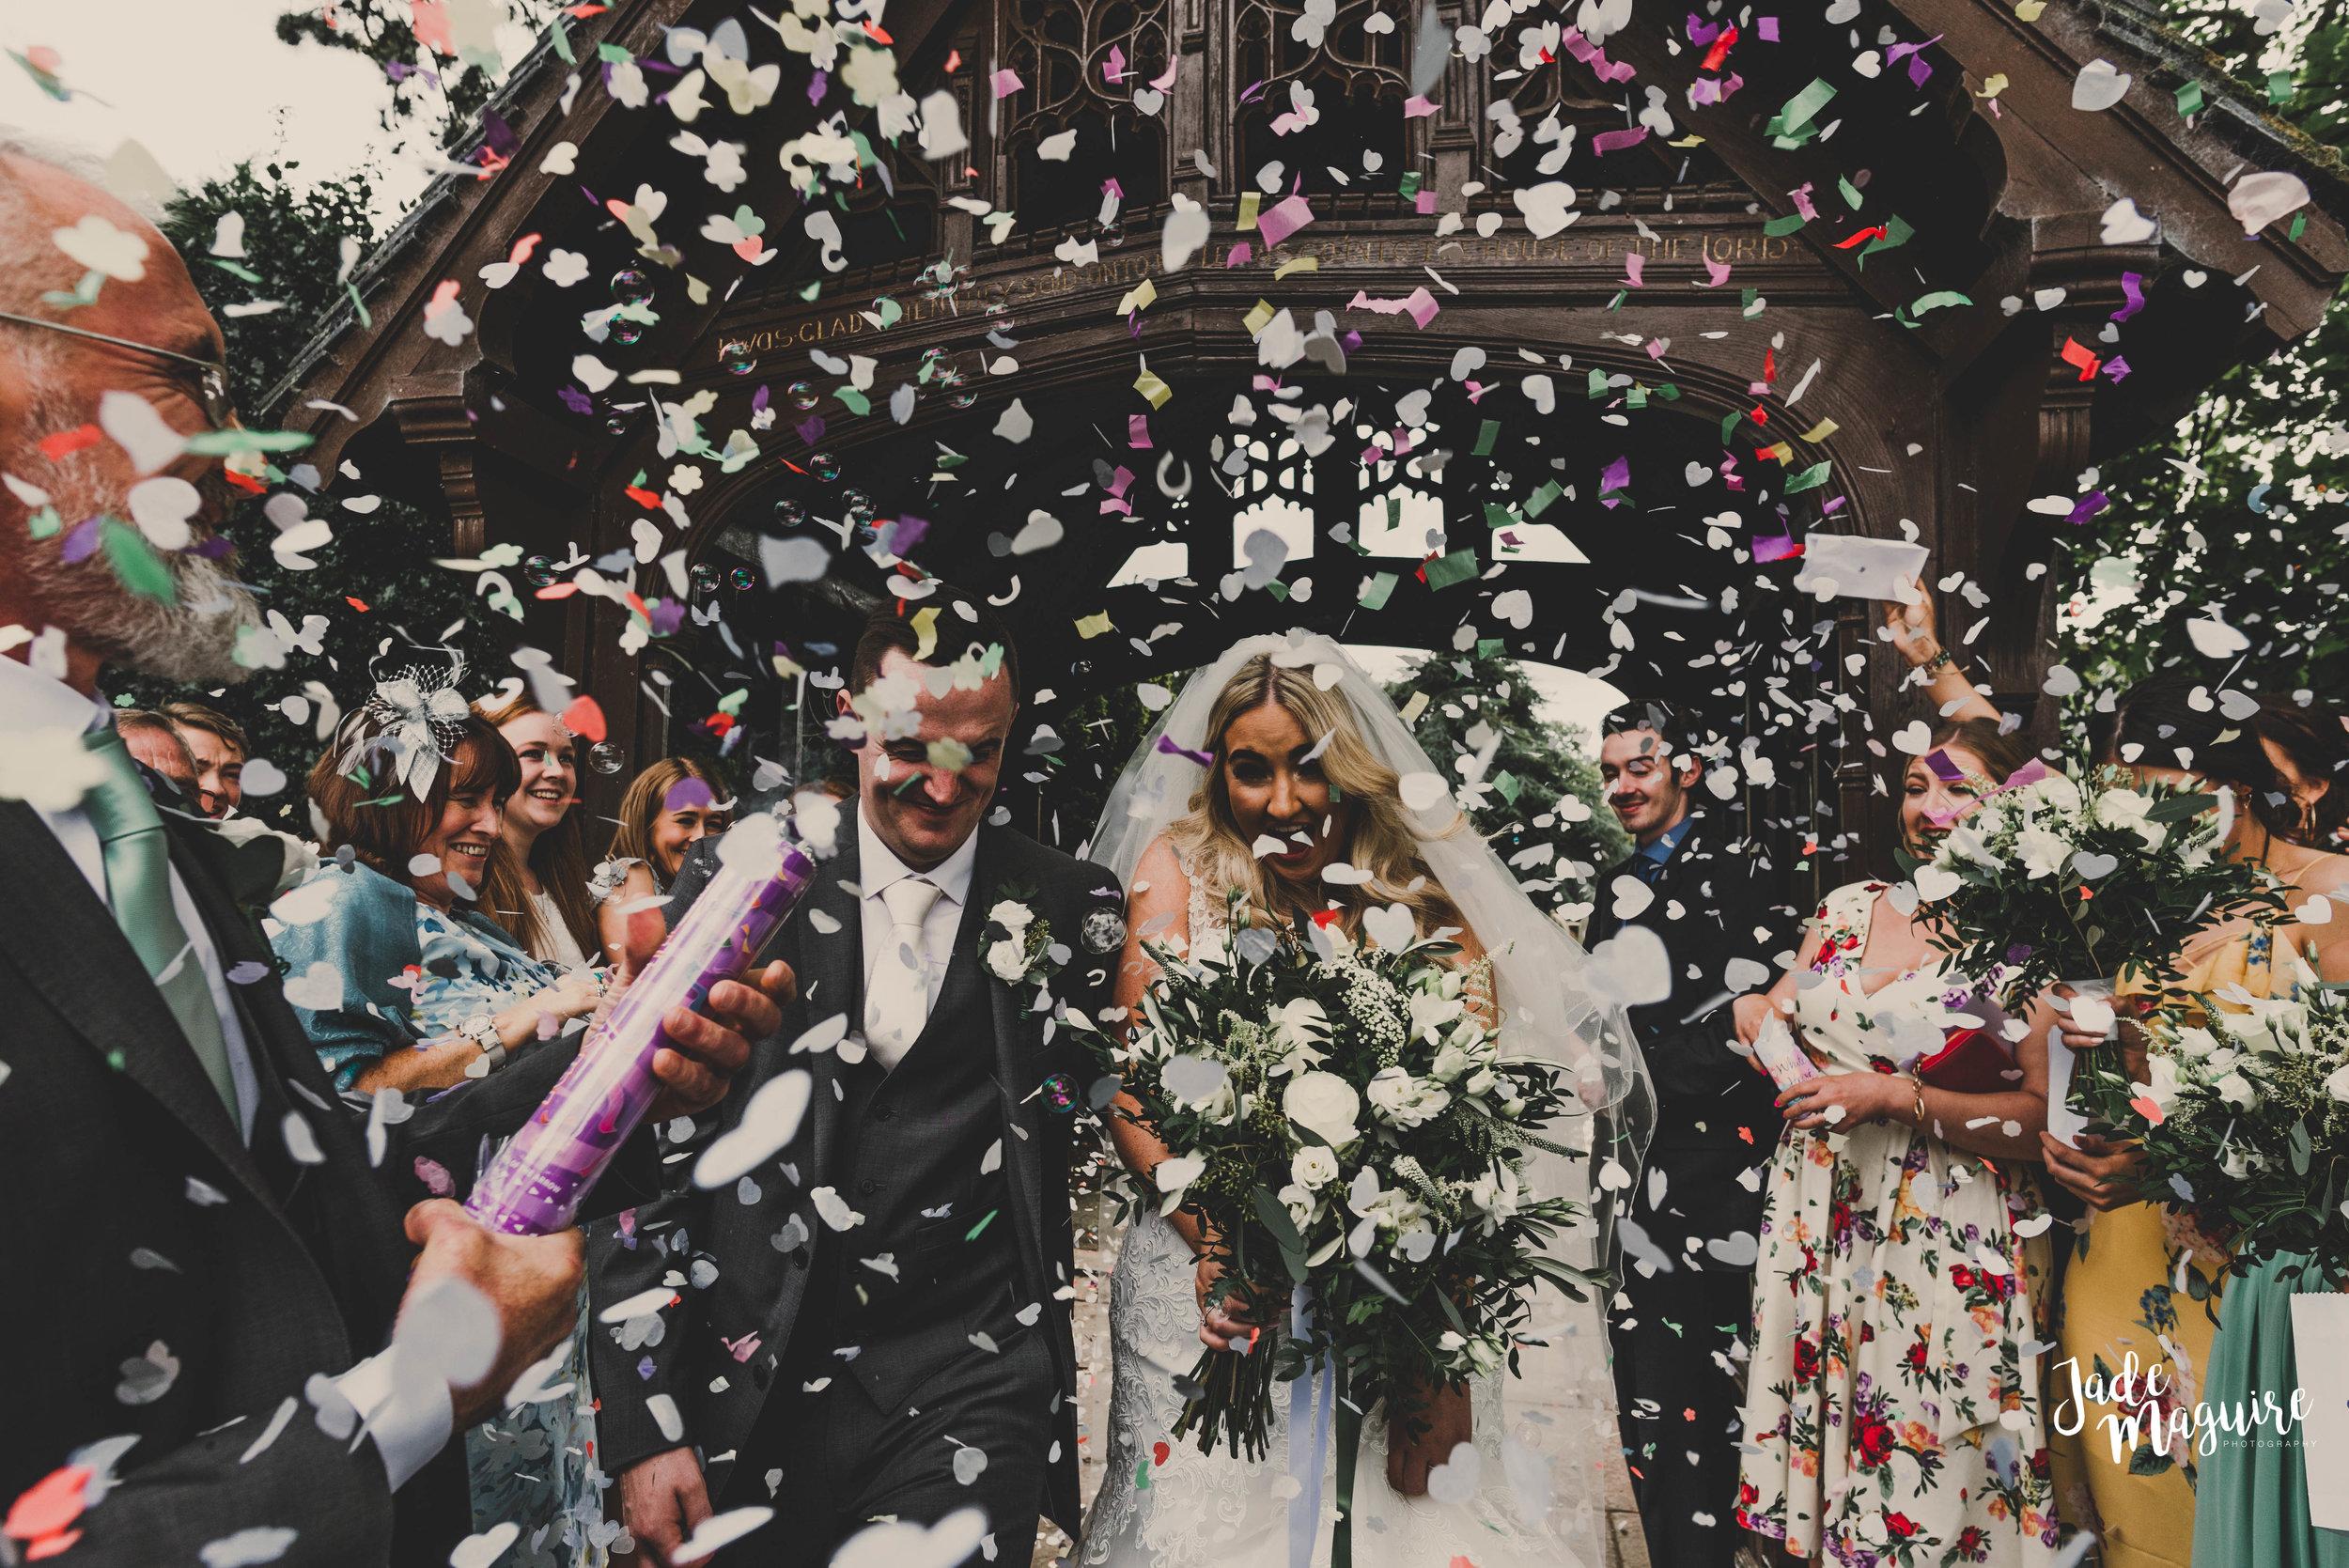 WEDDING: AMAZING woodland wedding photography sneak peak from the amazing Craxton Wood.